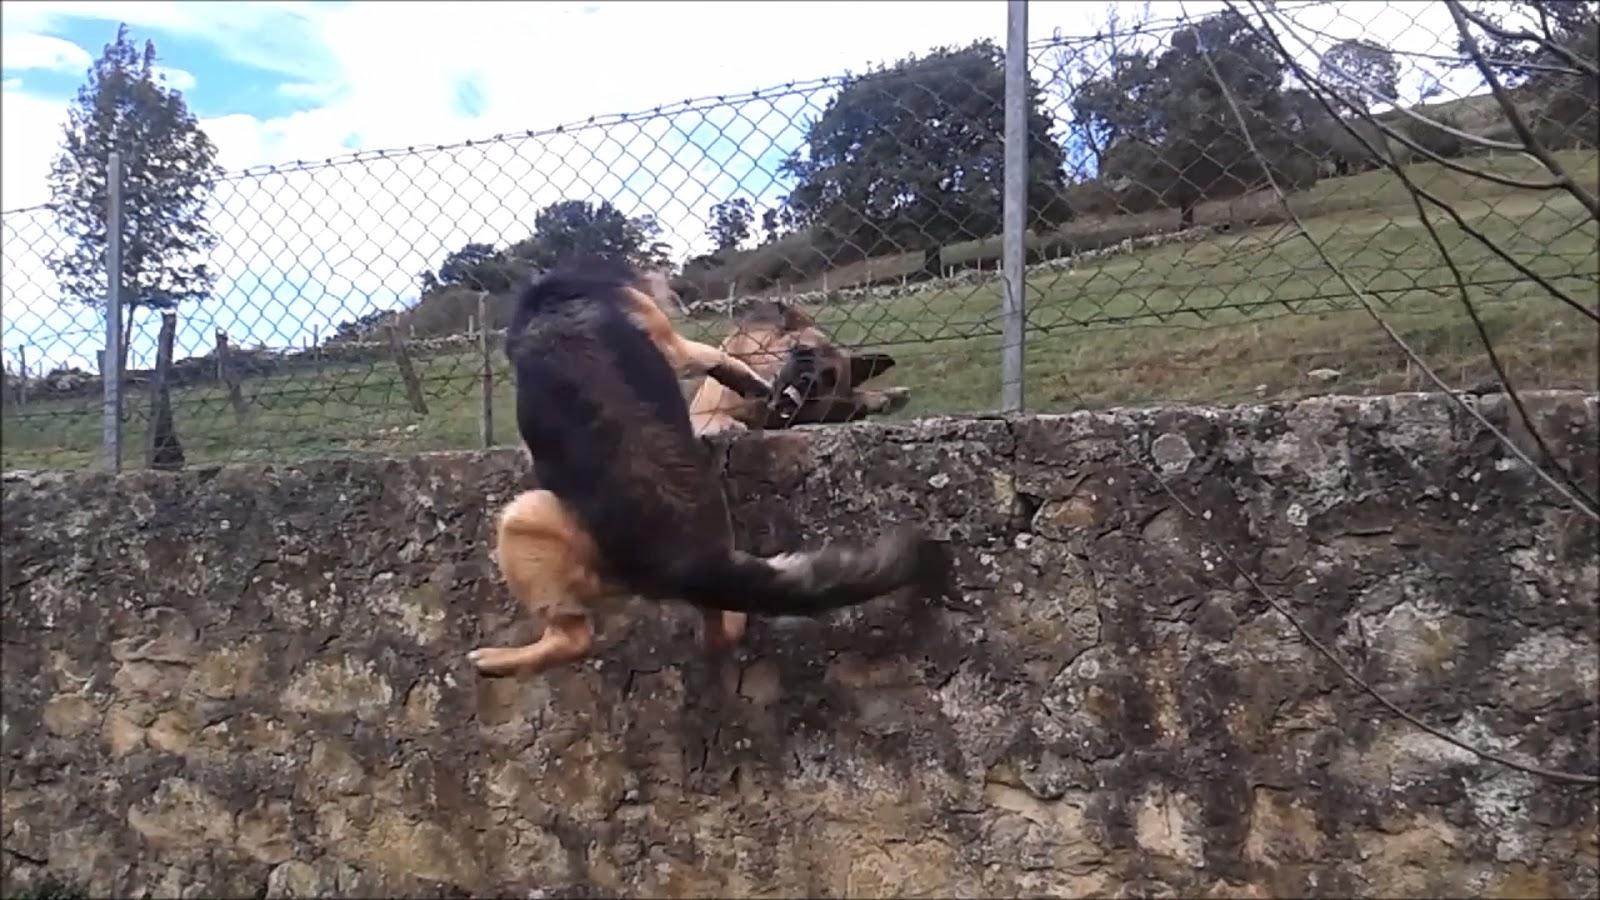 perro ladrando en la valla